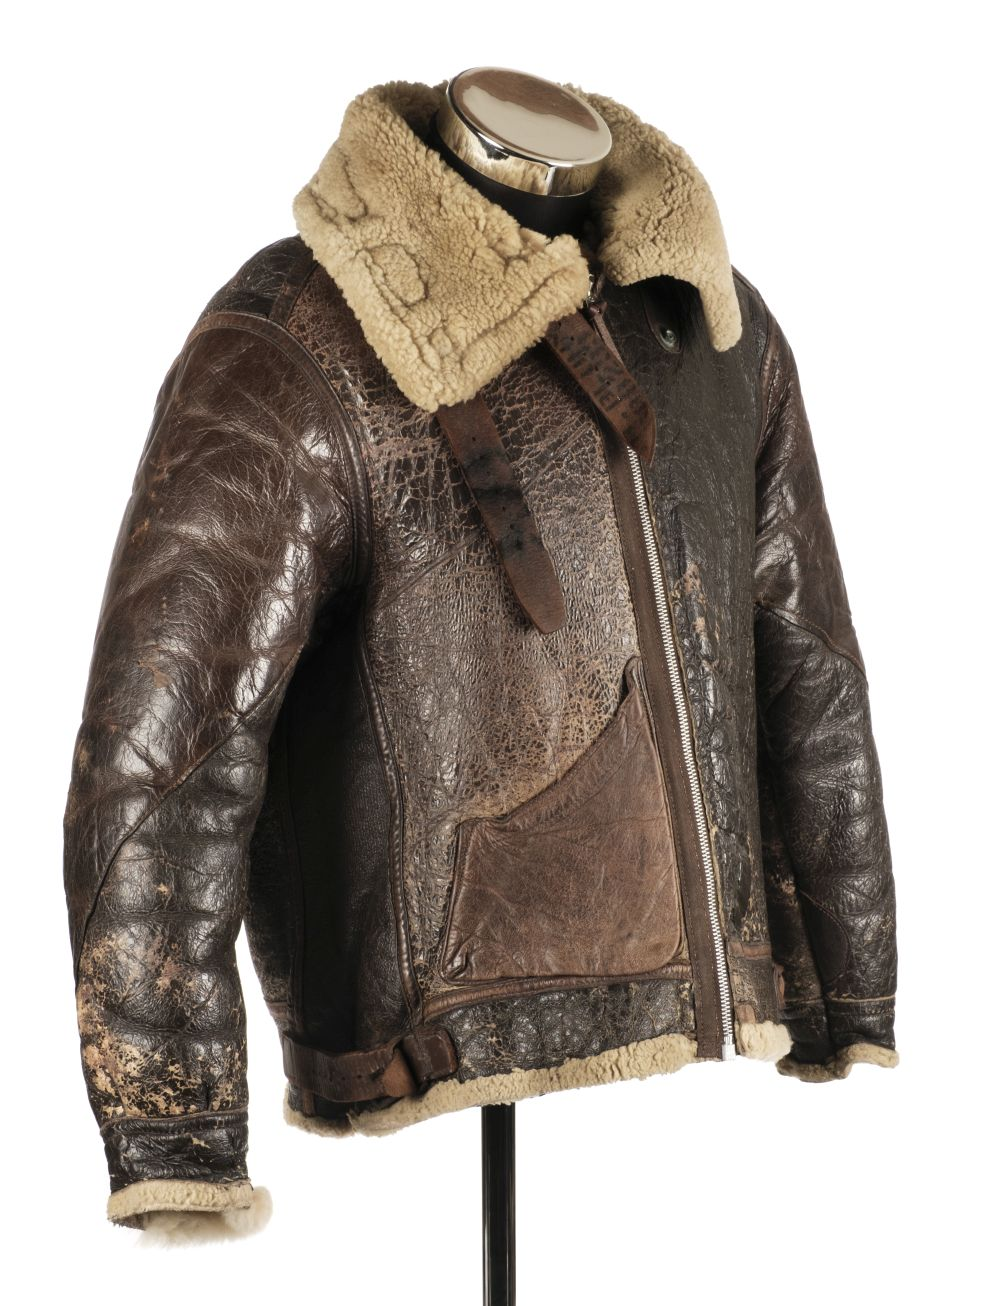 * Flying Jacket. WWII USAAF brown leather flying jacket